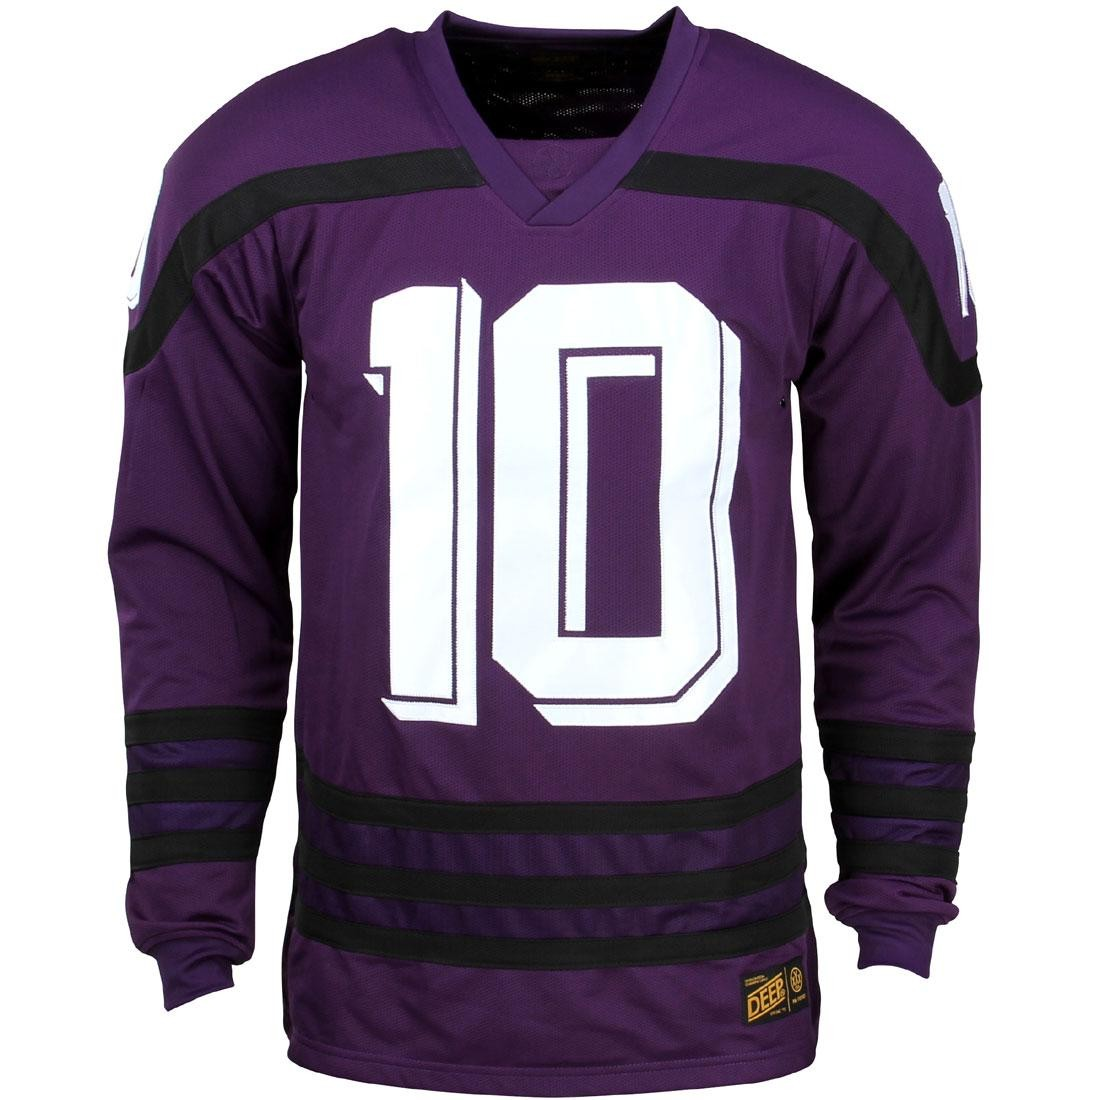 10 Deep Bazik Jersey Shirt (purple)